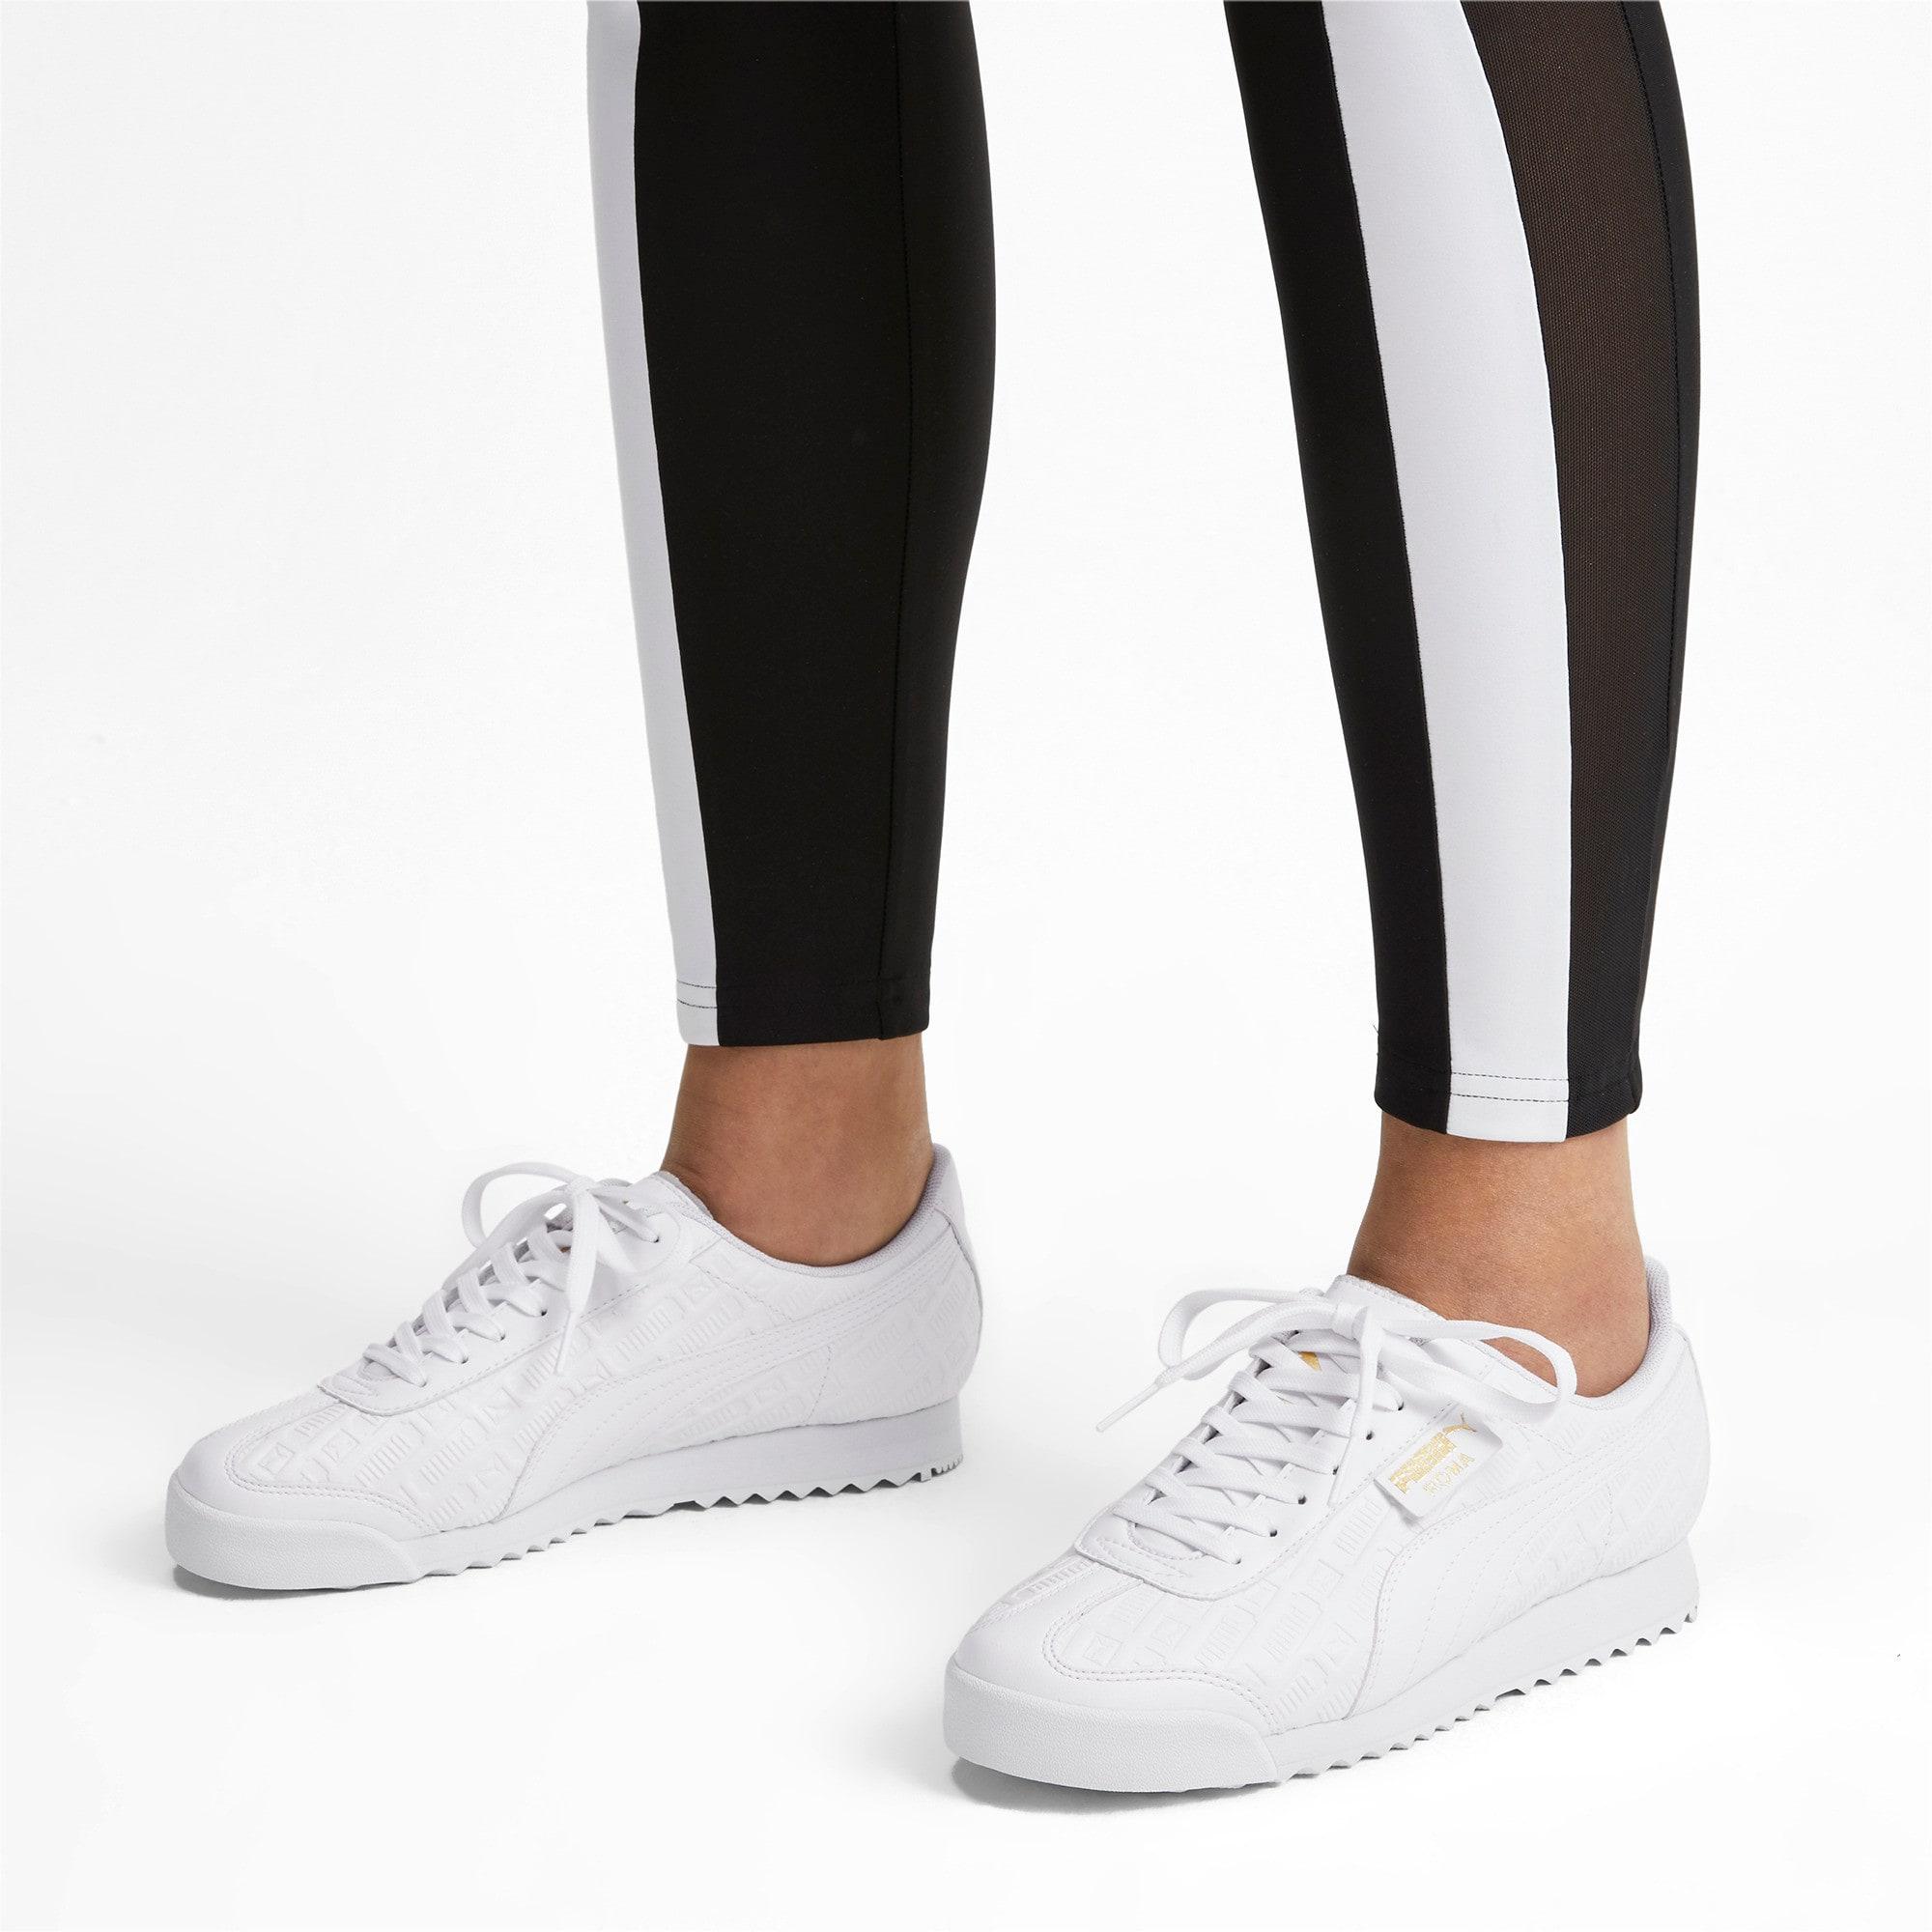 Thumbnail 2 of Roma Reinvent Women's Sneakers, Puma White-Puma Team Gold, medium